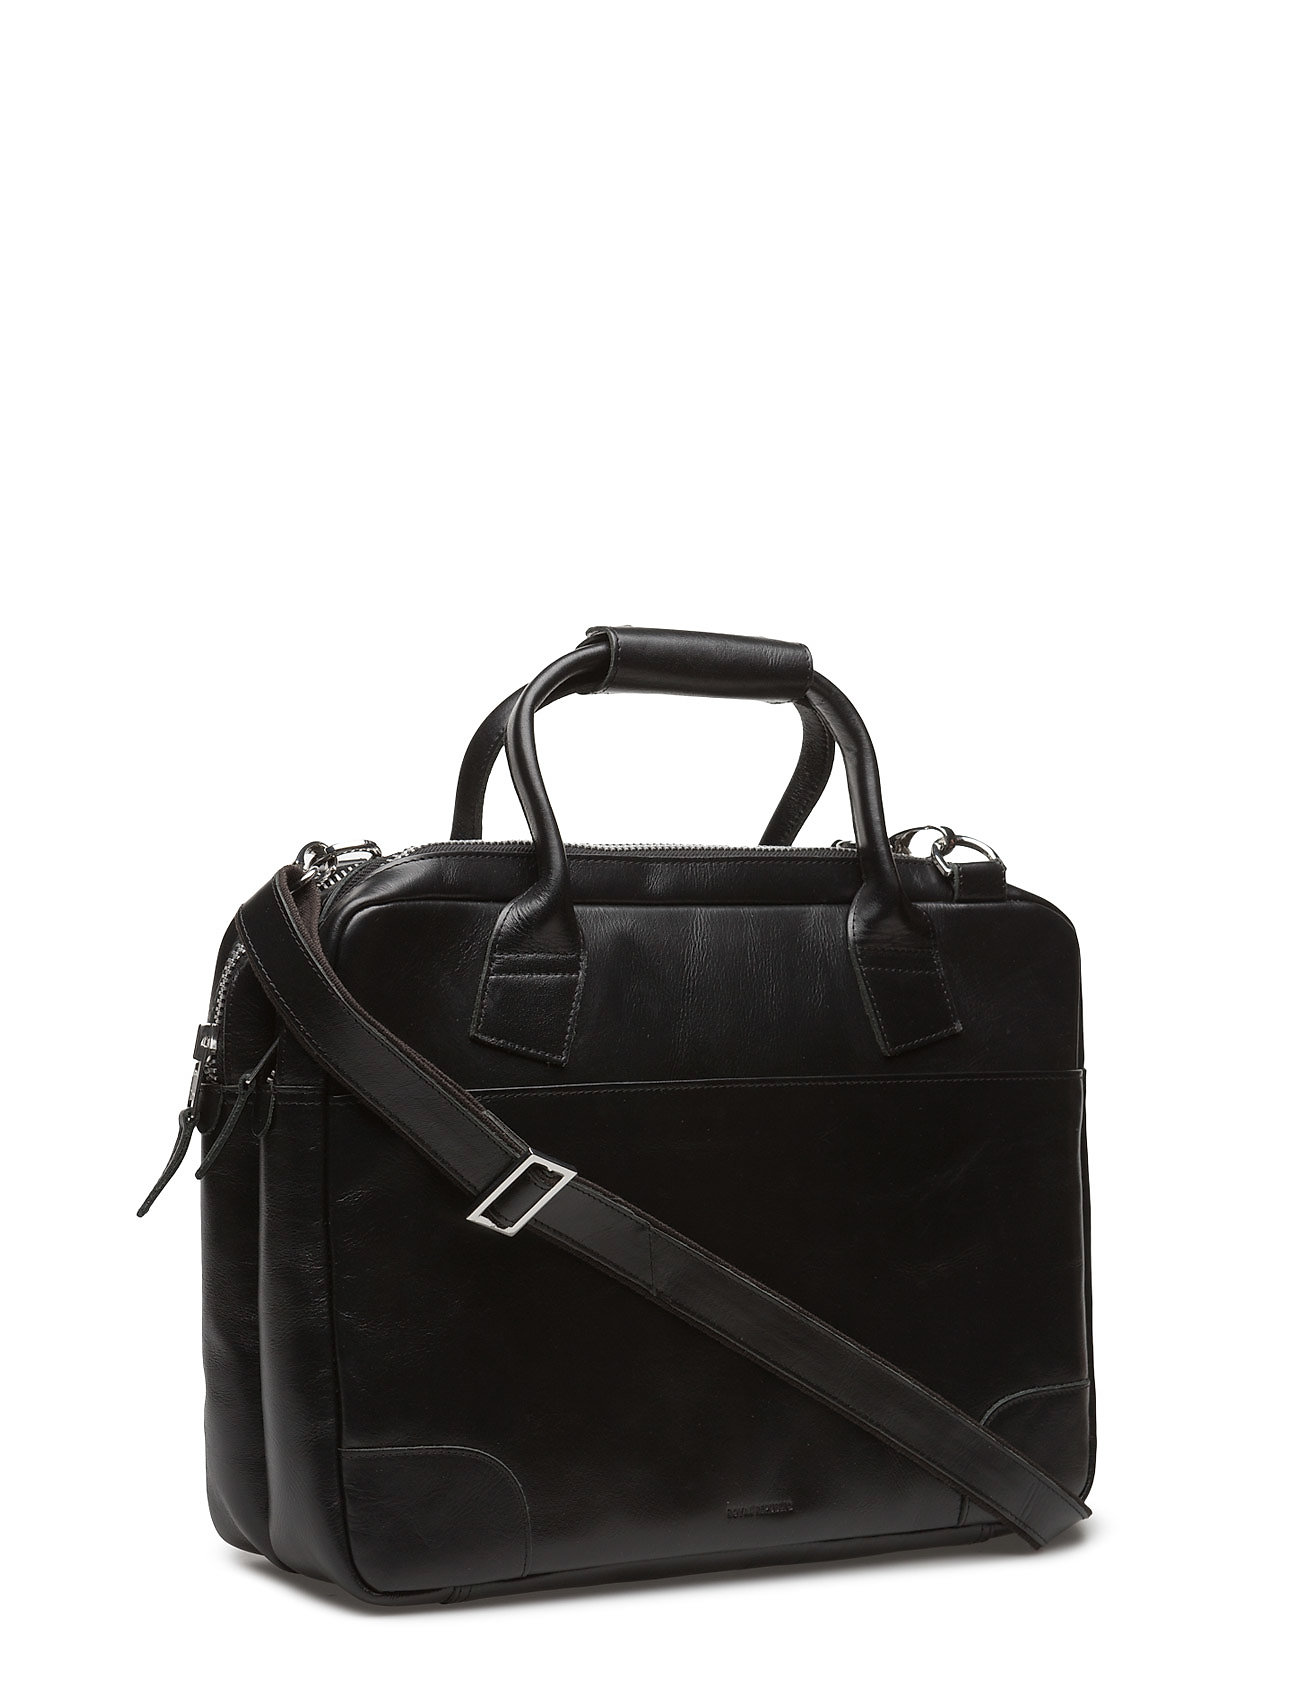 Nano Bag LeatherblackRoyal Republiq Zip Big GUzpqVSM